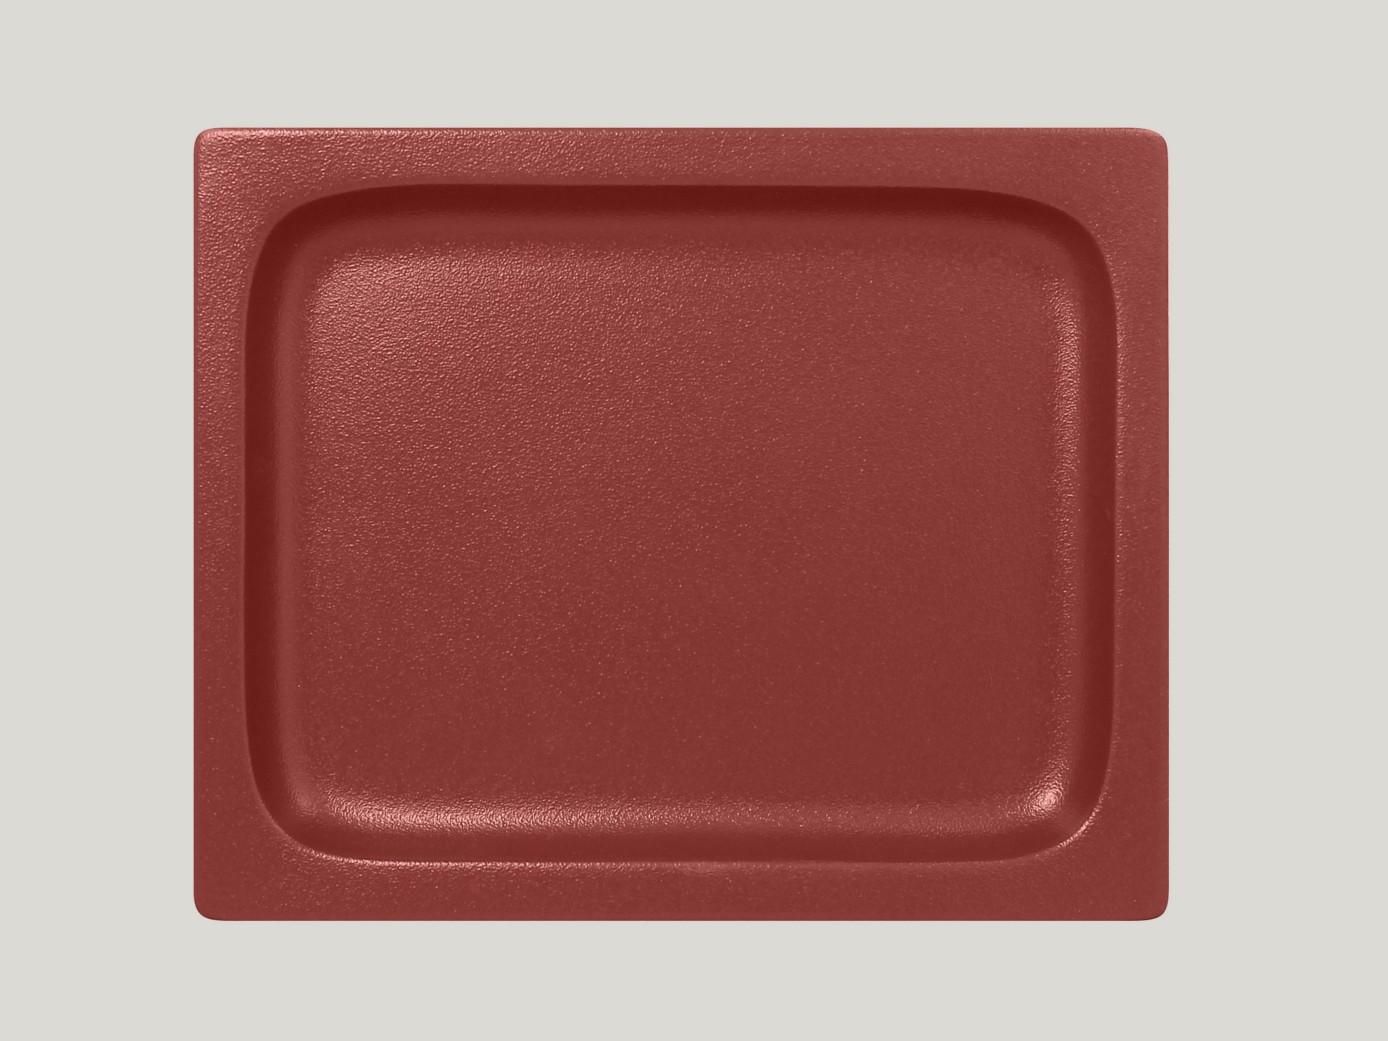 Gastronorm Pánvička 1/2F - tmavě červená Neofusion